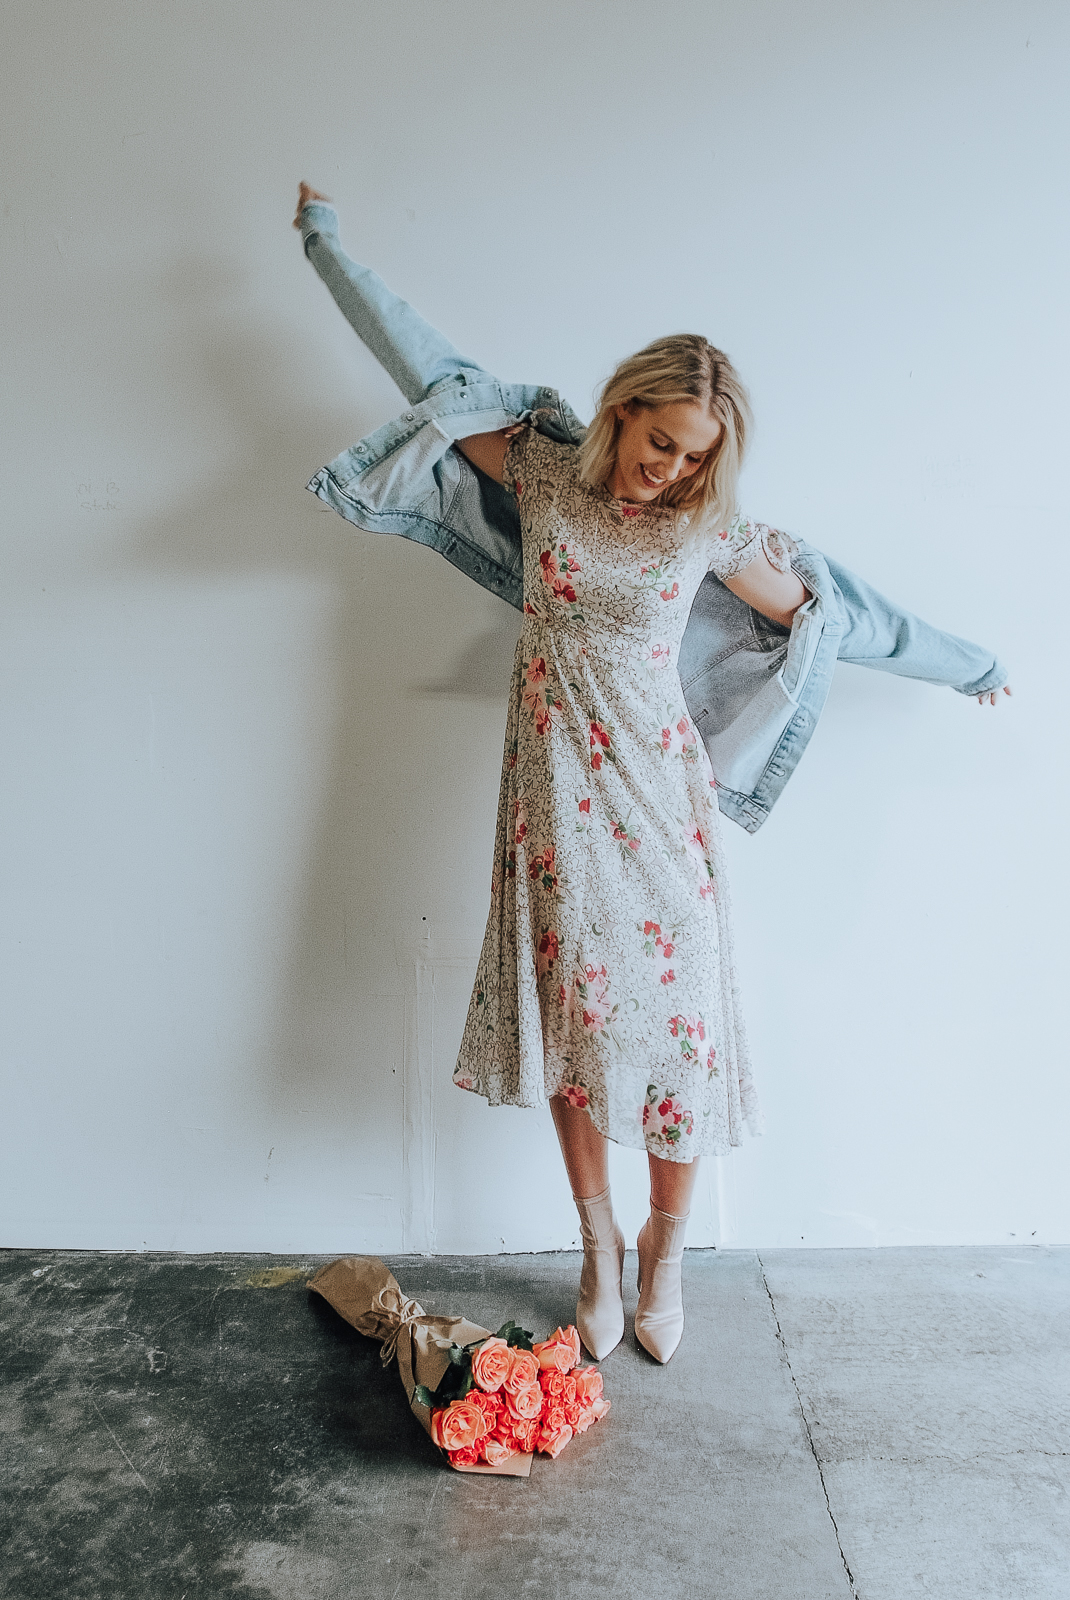 Autumn Sorelle | Valentine's Day Outfits